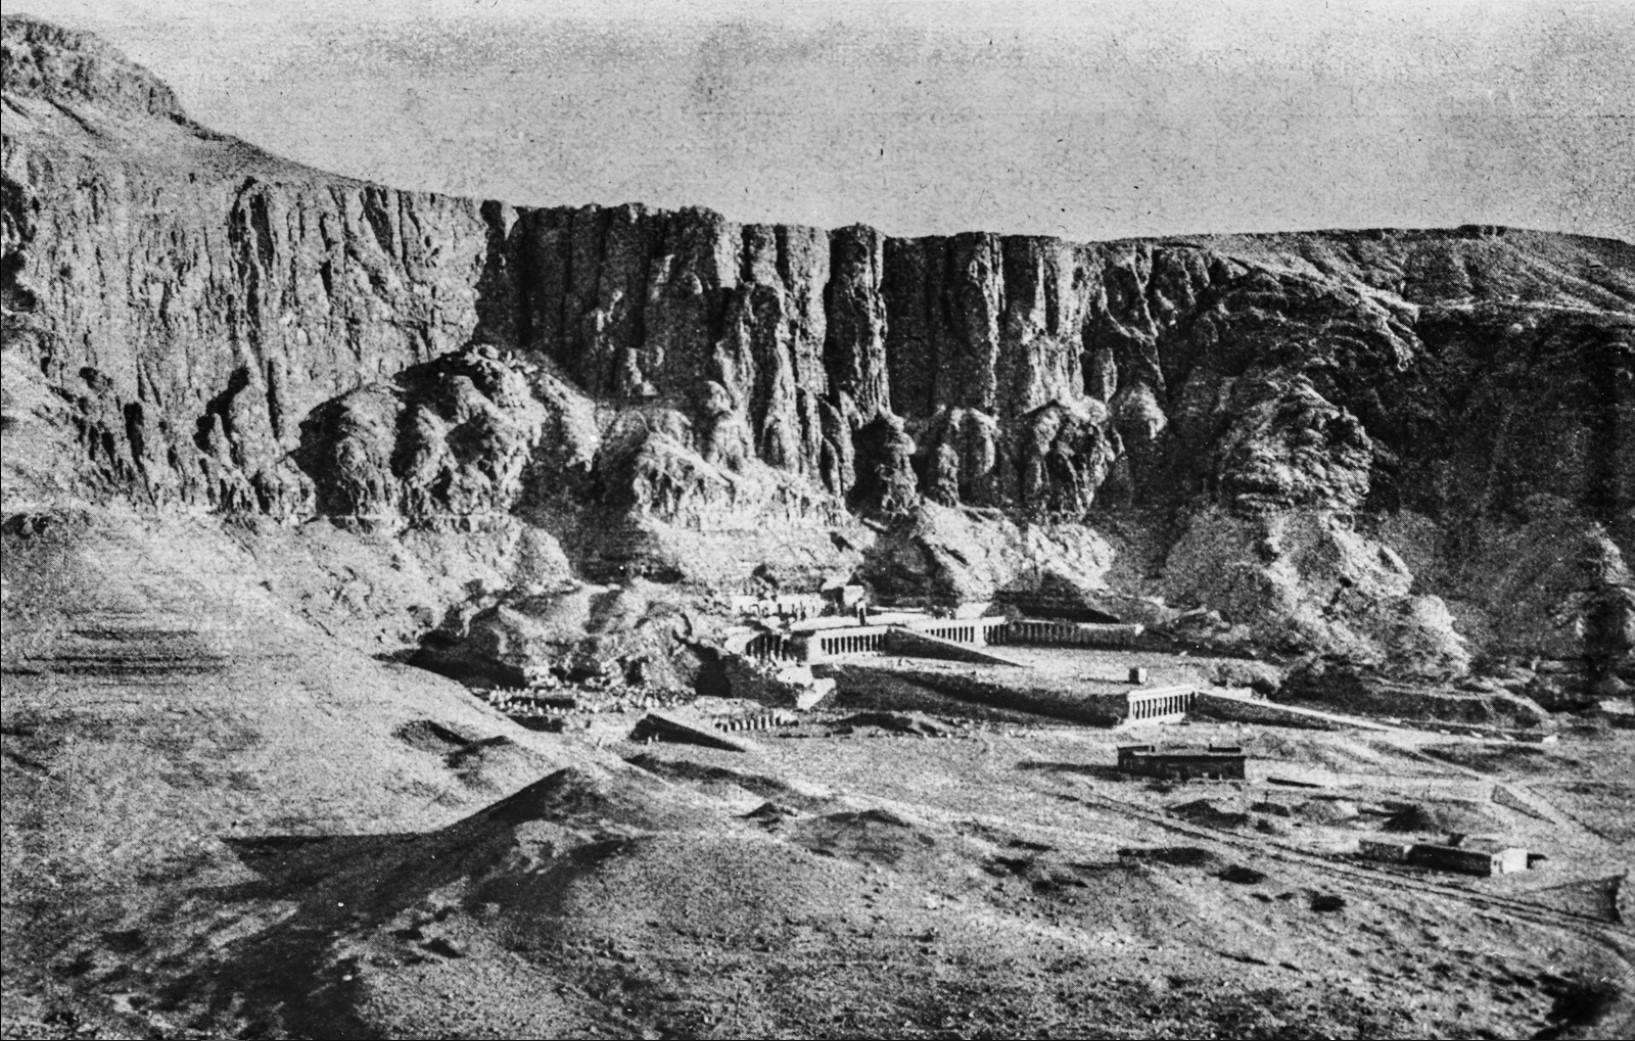 Вид храмового комплекса Дейр-аль-Бахри с храмом Хатшепсут